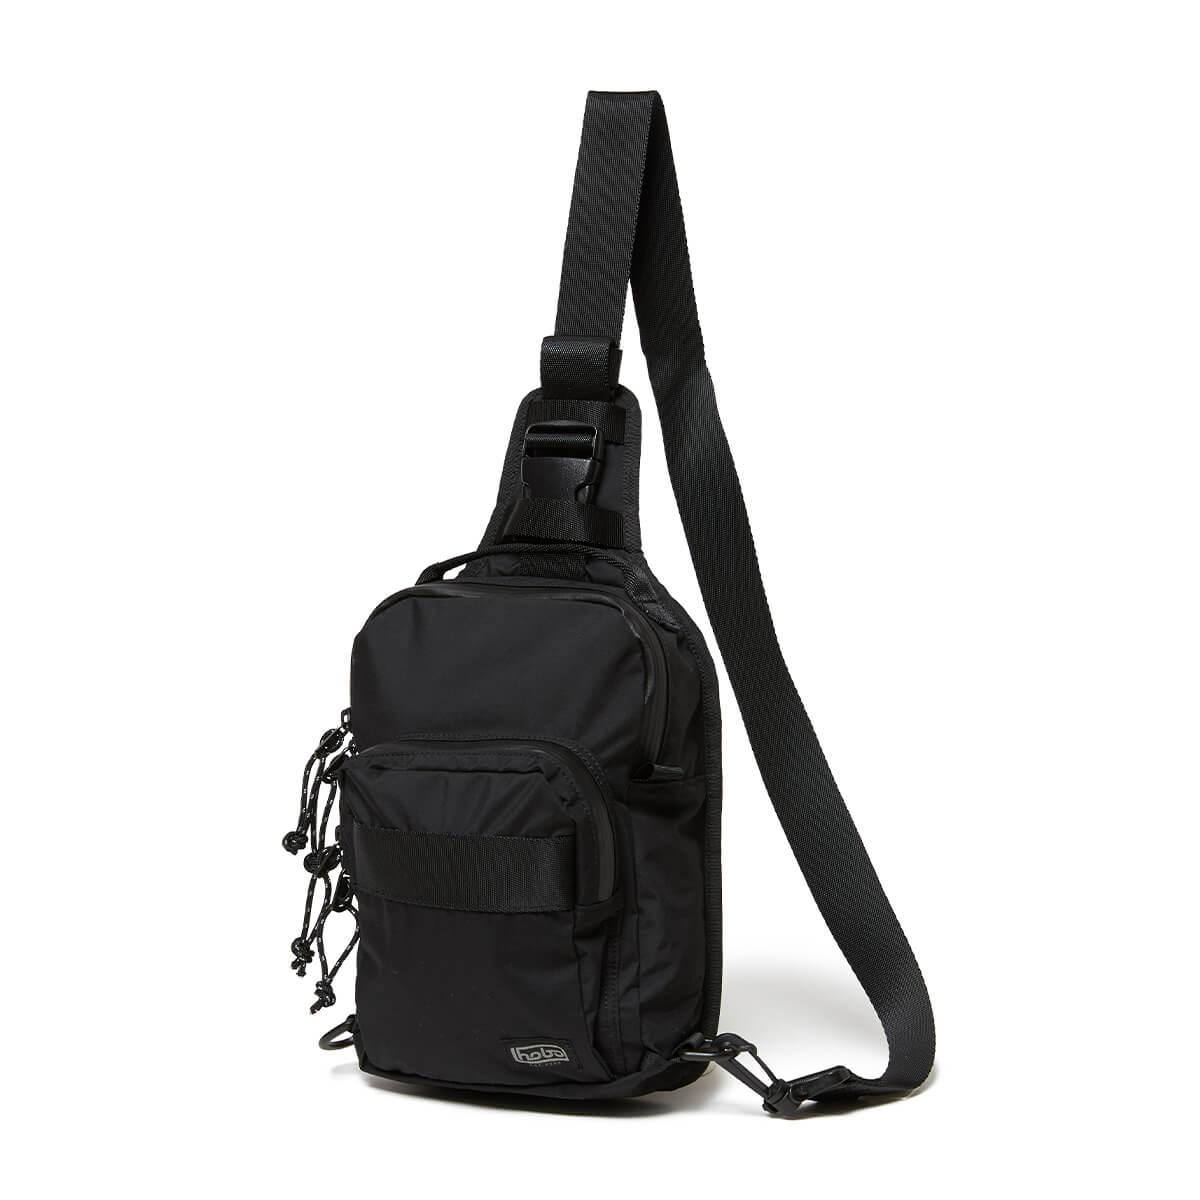 HOBO / Breathatec®︎ Nylon Sling Shoulder Bag